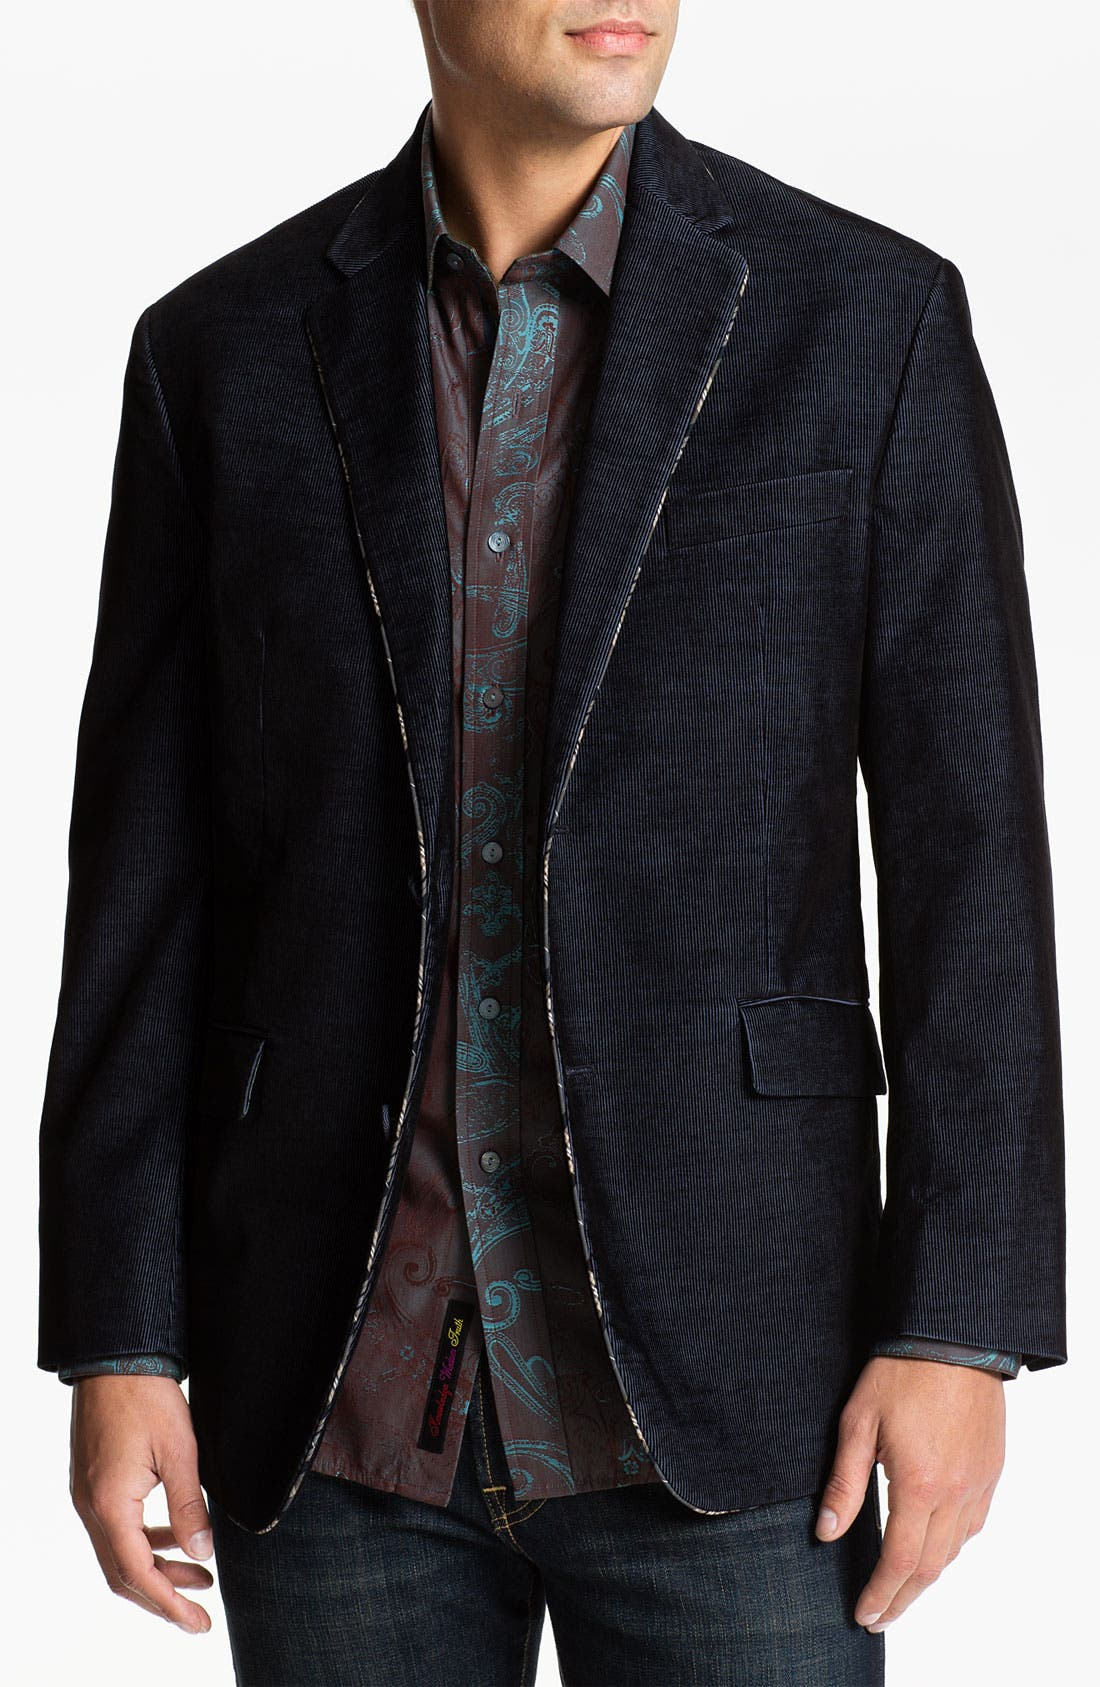 Alternate Image 1 Selected - Robert Graham 'Lintel' Corduroy Sportcoat